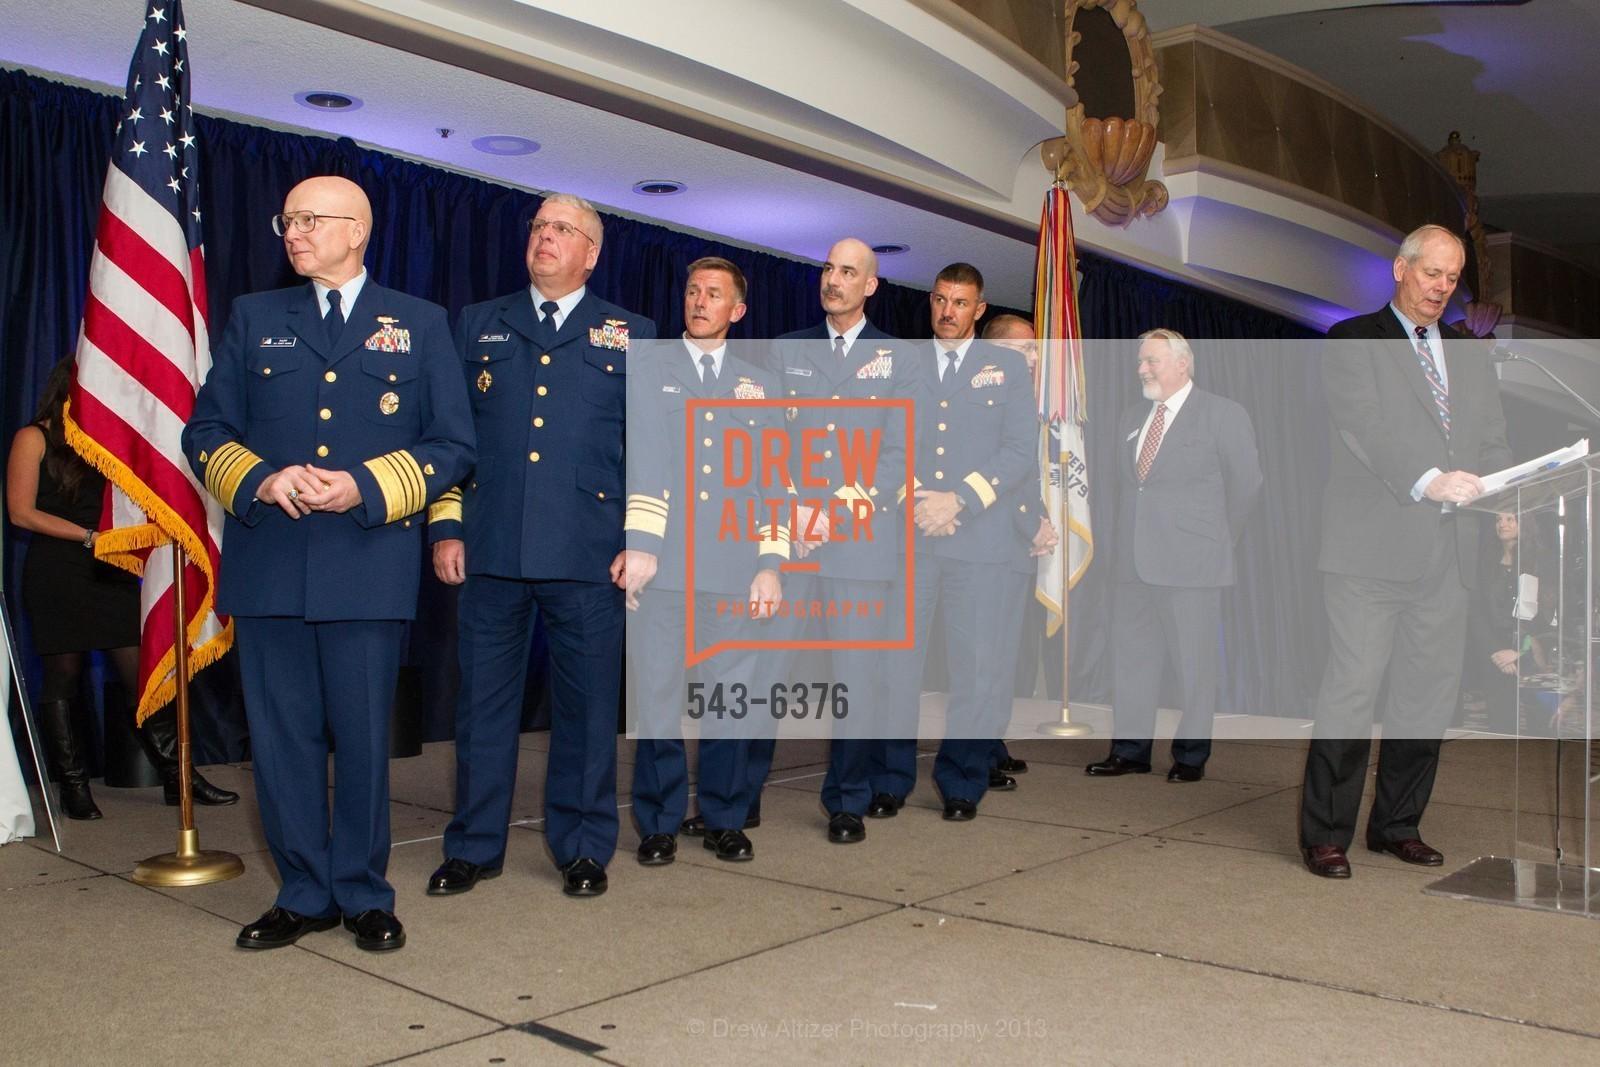 Robert Papp, John Currier, Thomas Ostebo, Karl Schultz, Michael Leavitt, Bob Flynn, Gary Jobson, Photo #543-6376